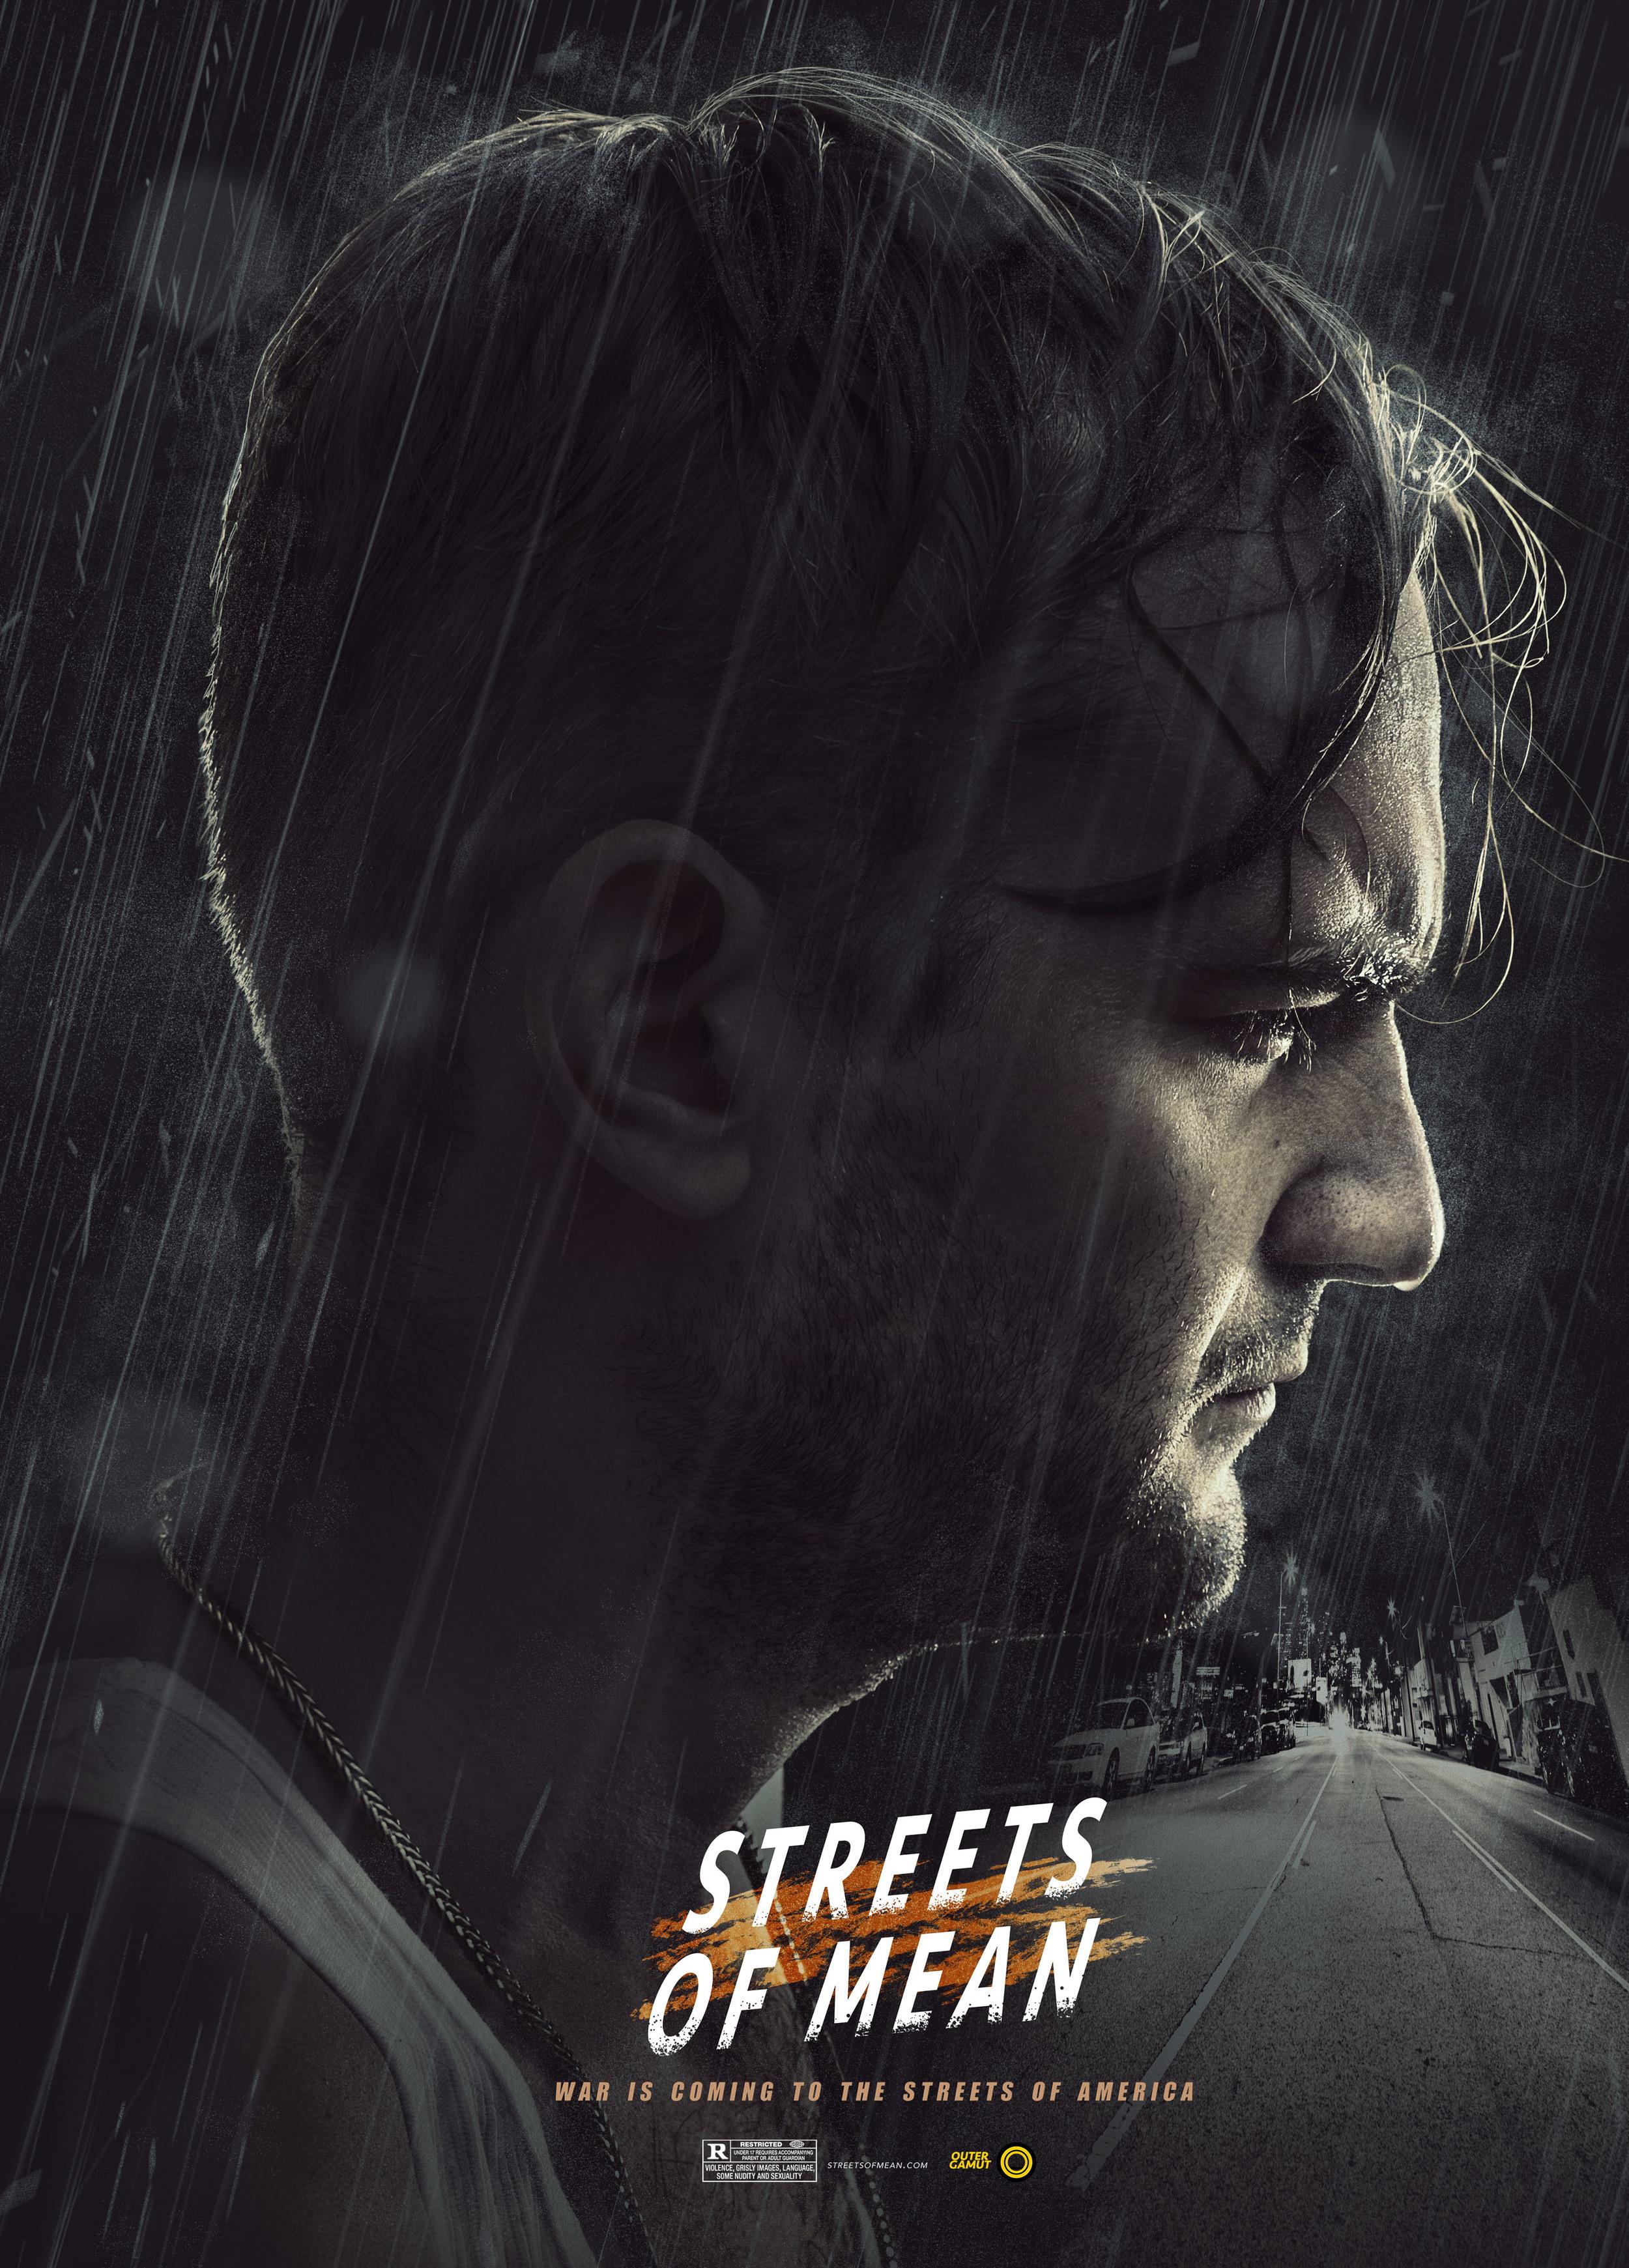 streets of mean_final.jpg